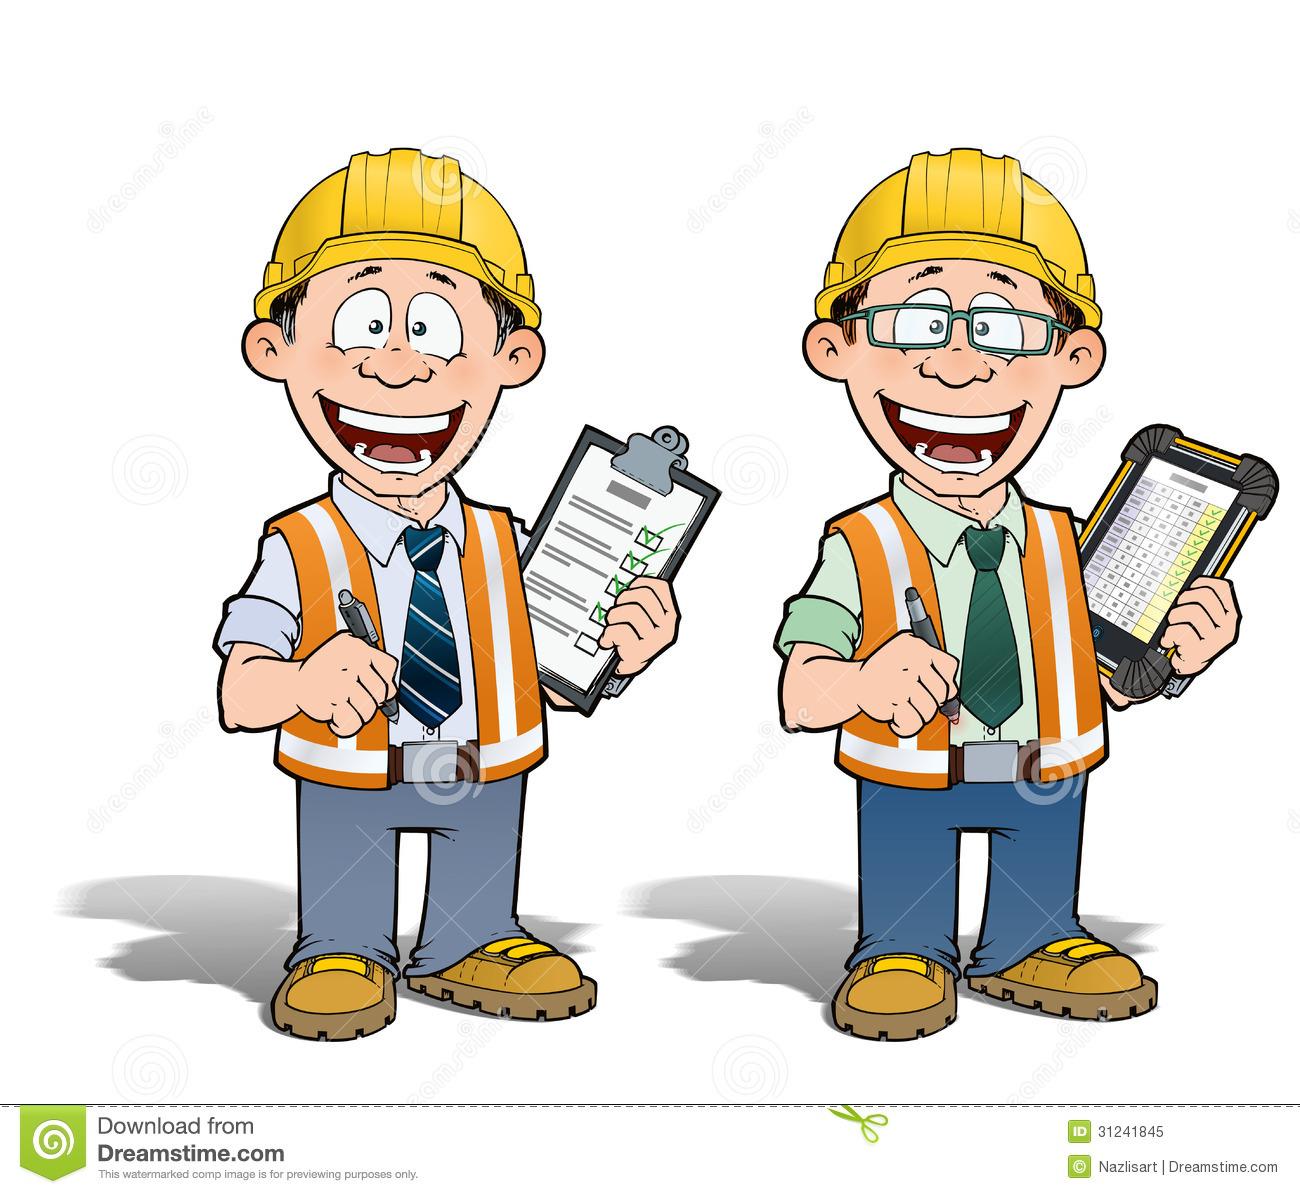 Architect clipart builder. Architecture construction manager pencil